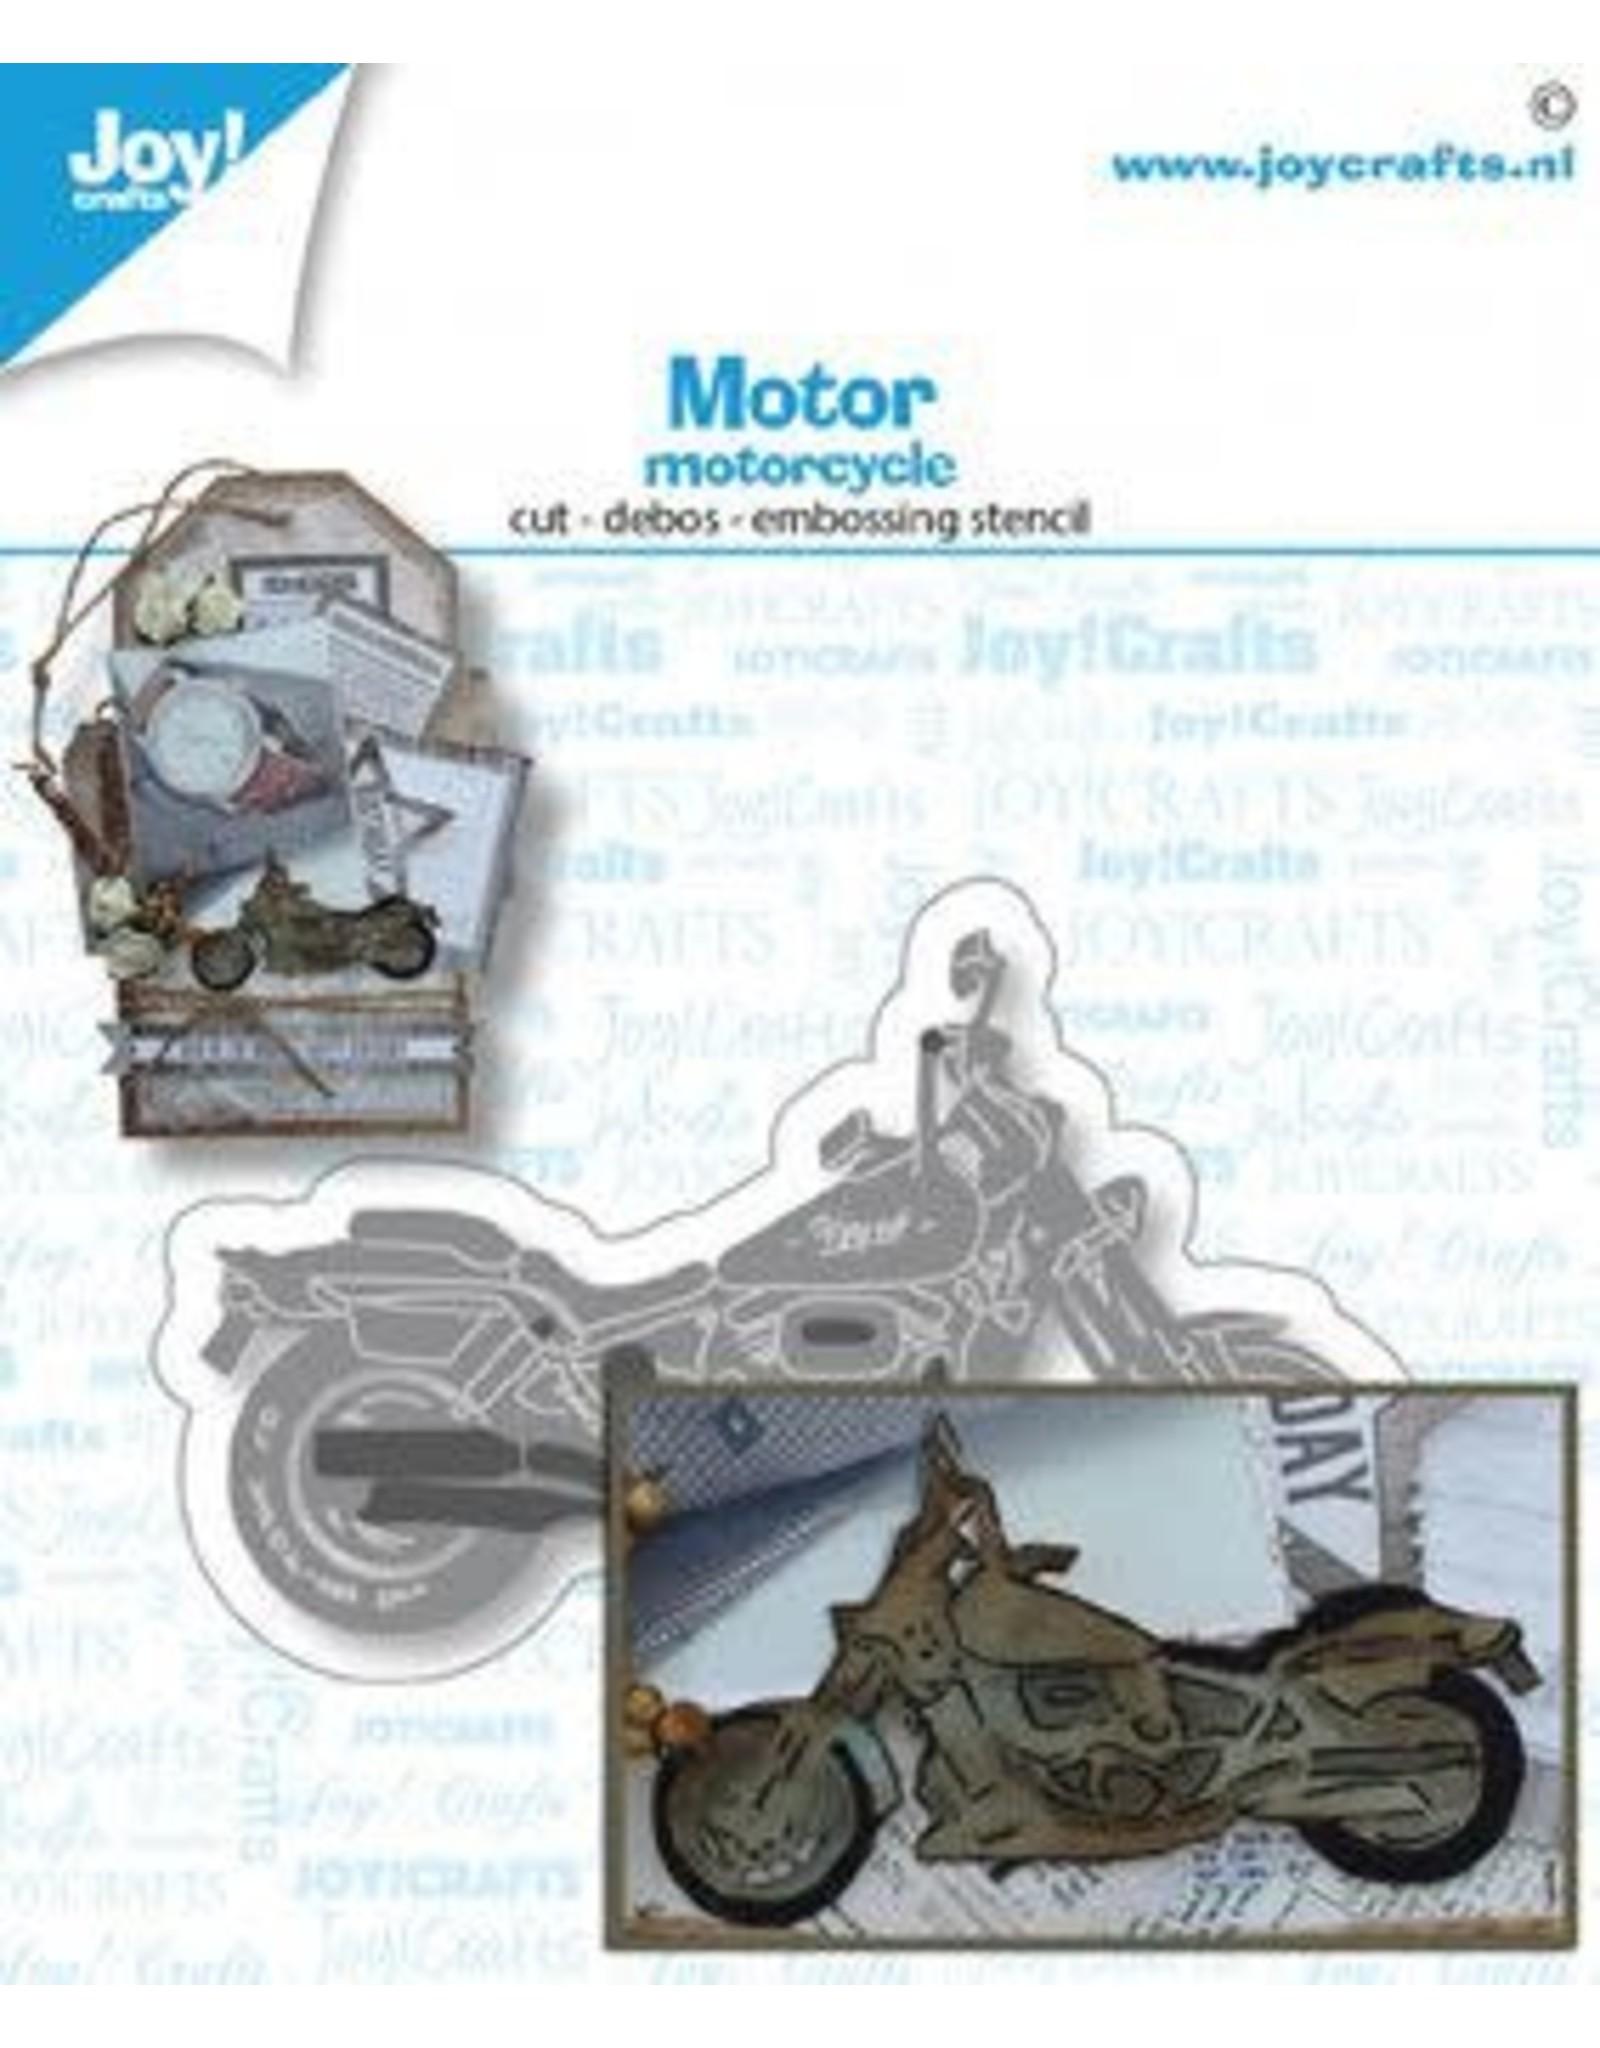 Joy Craft Joy! Crafts Snij-embosstansmal - Motor 6002/1512 75x44 mm